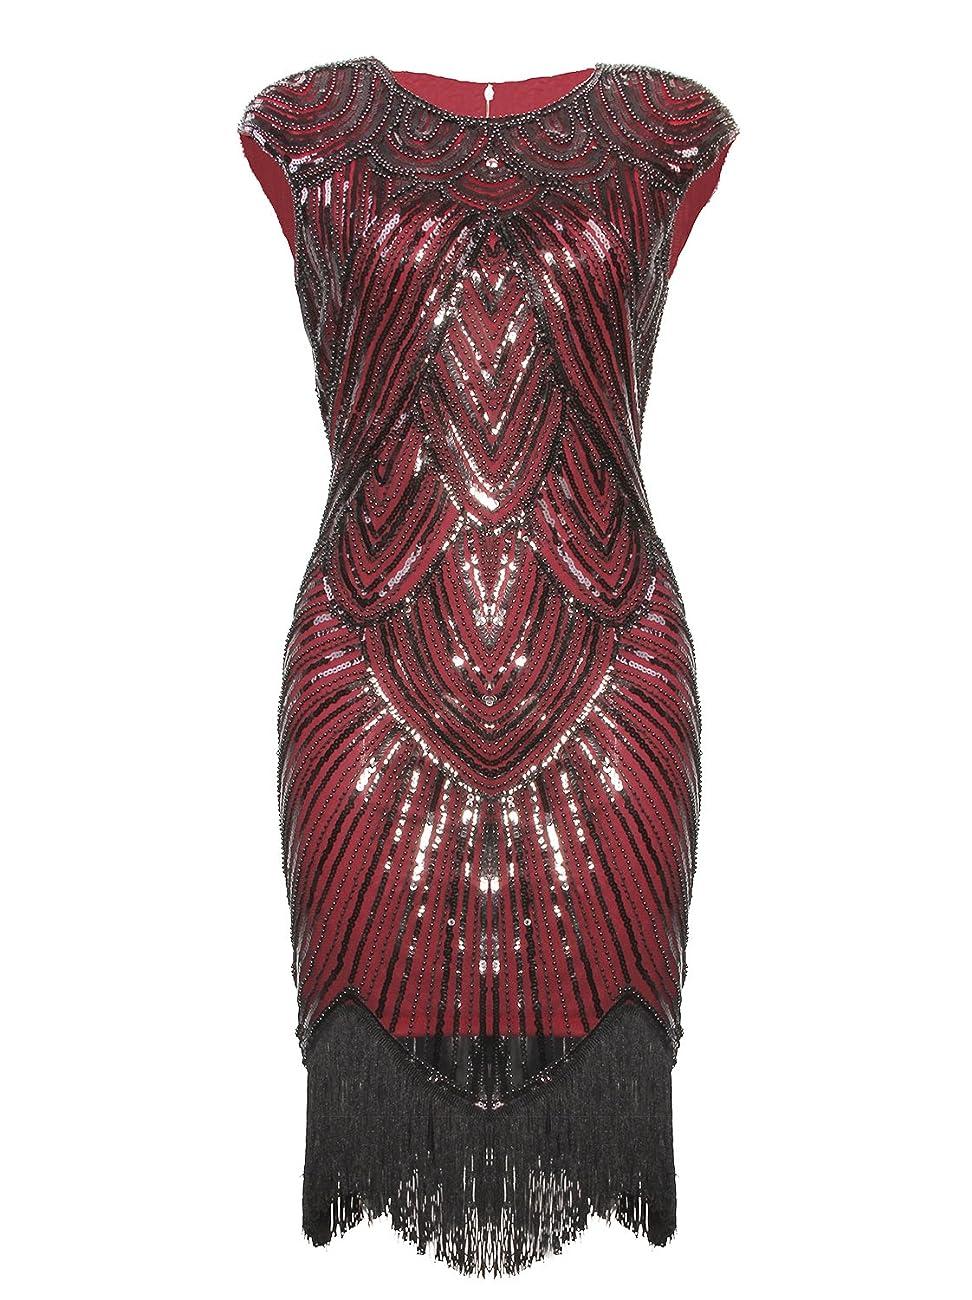 Vijiv Art Deco Great Gatsby Inspired Tassel Beaded 1920s Flapper Dress 0